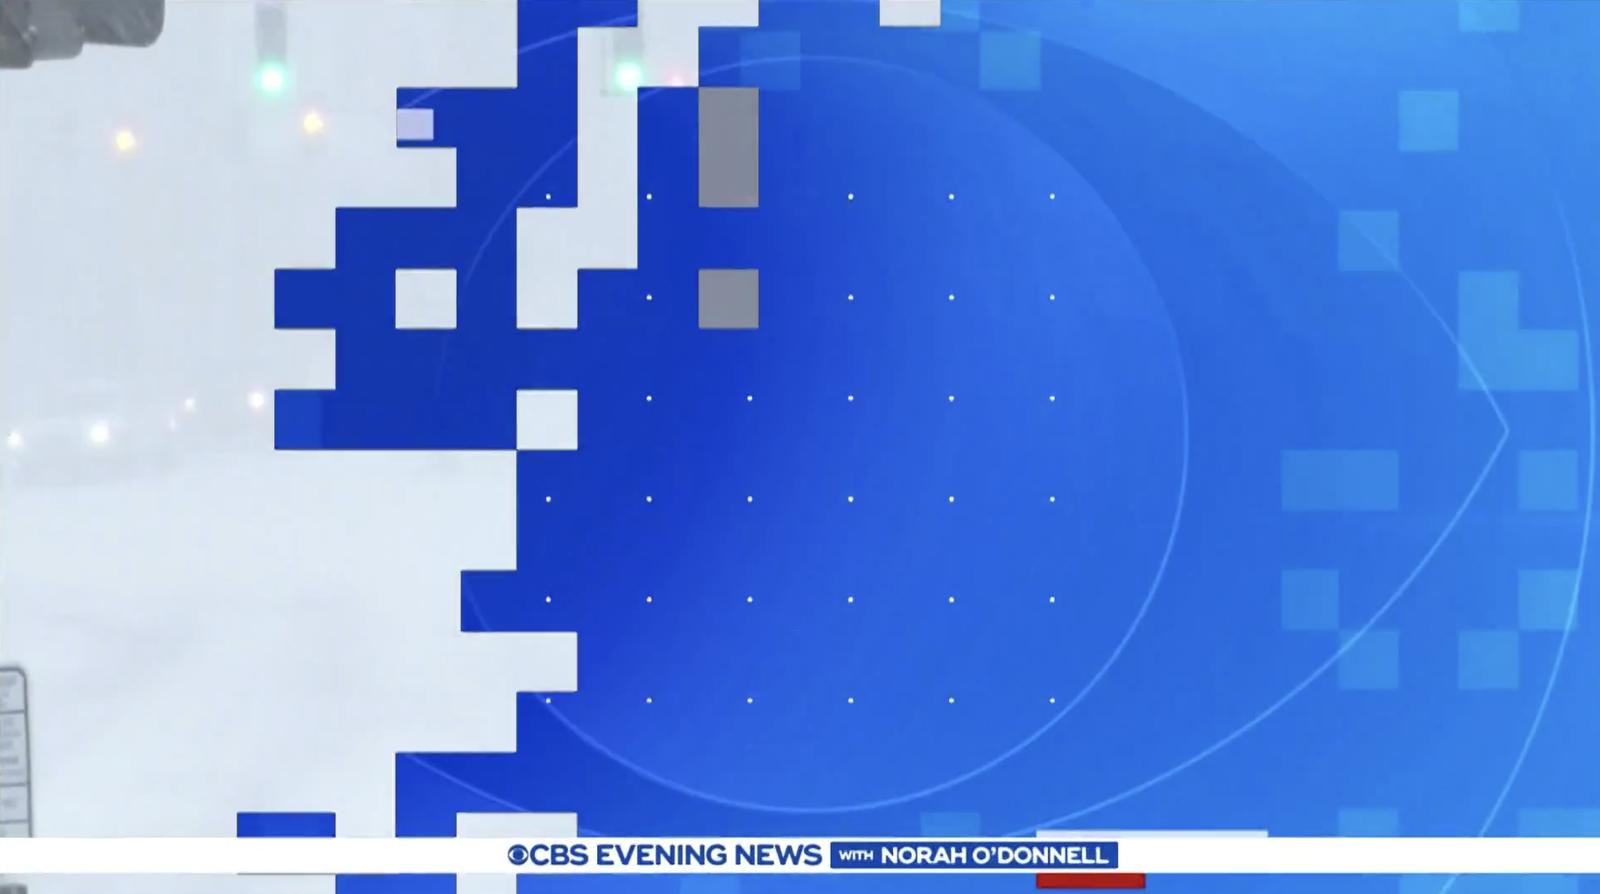 NCS_CBS-Evening-News_Motion-Design_Washington_004